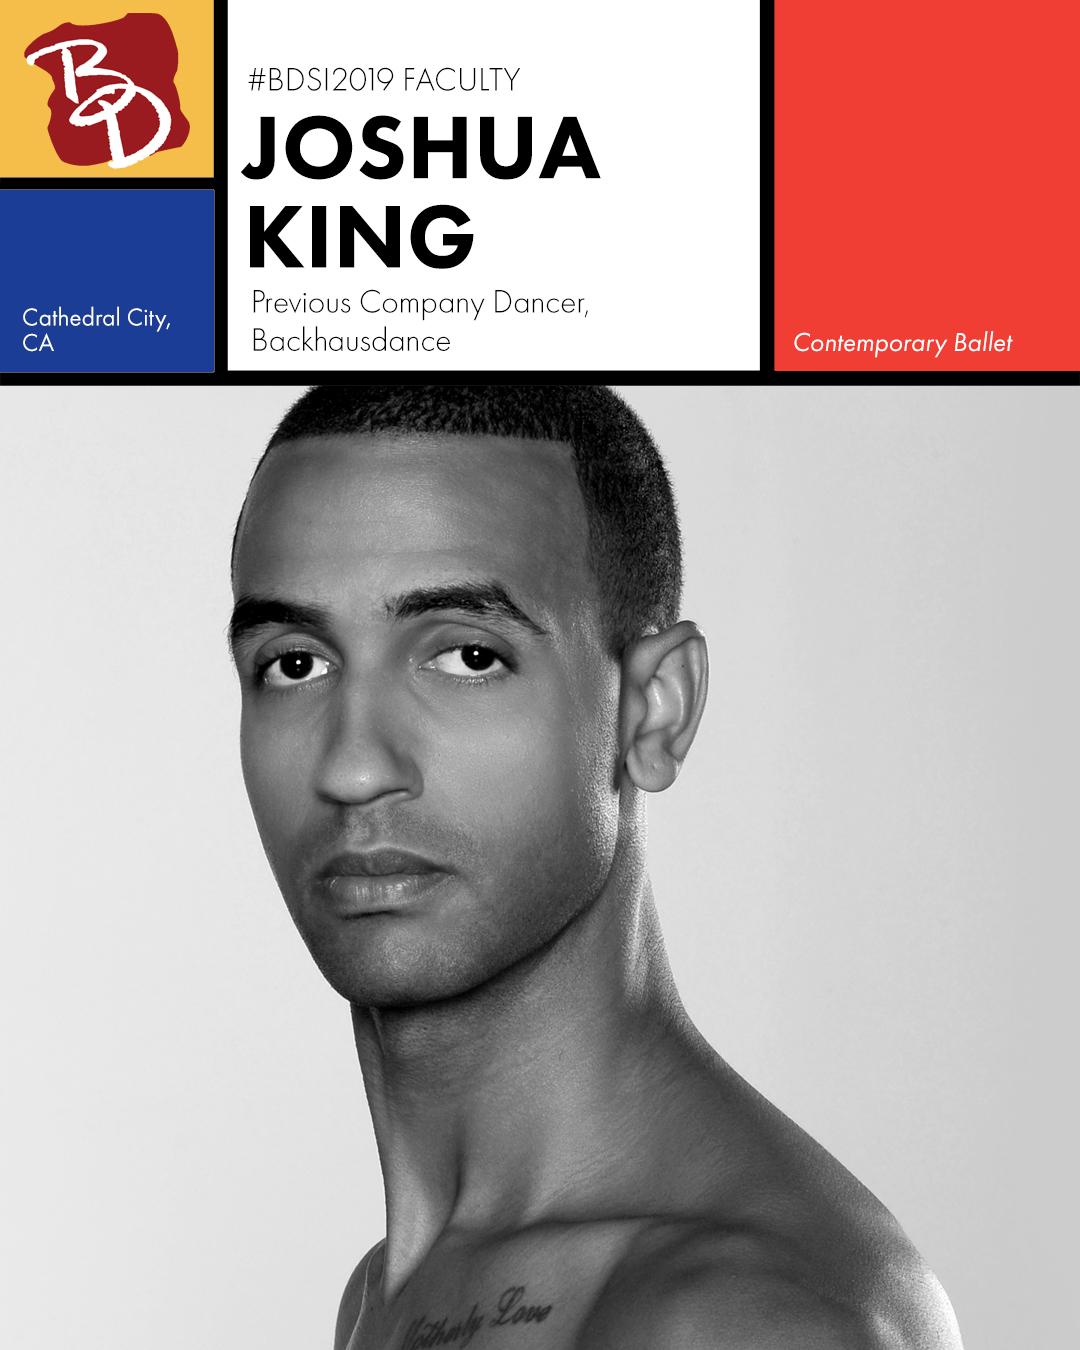 Faculty Announcement - King Joshua.jpg